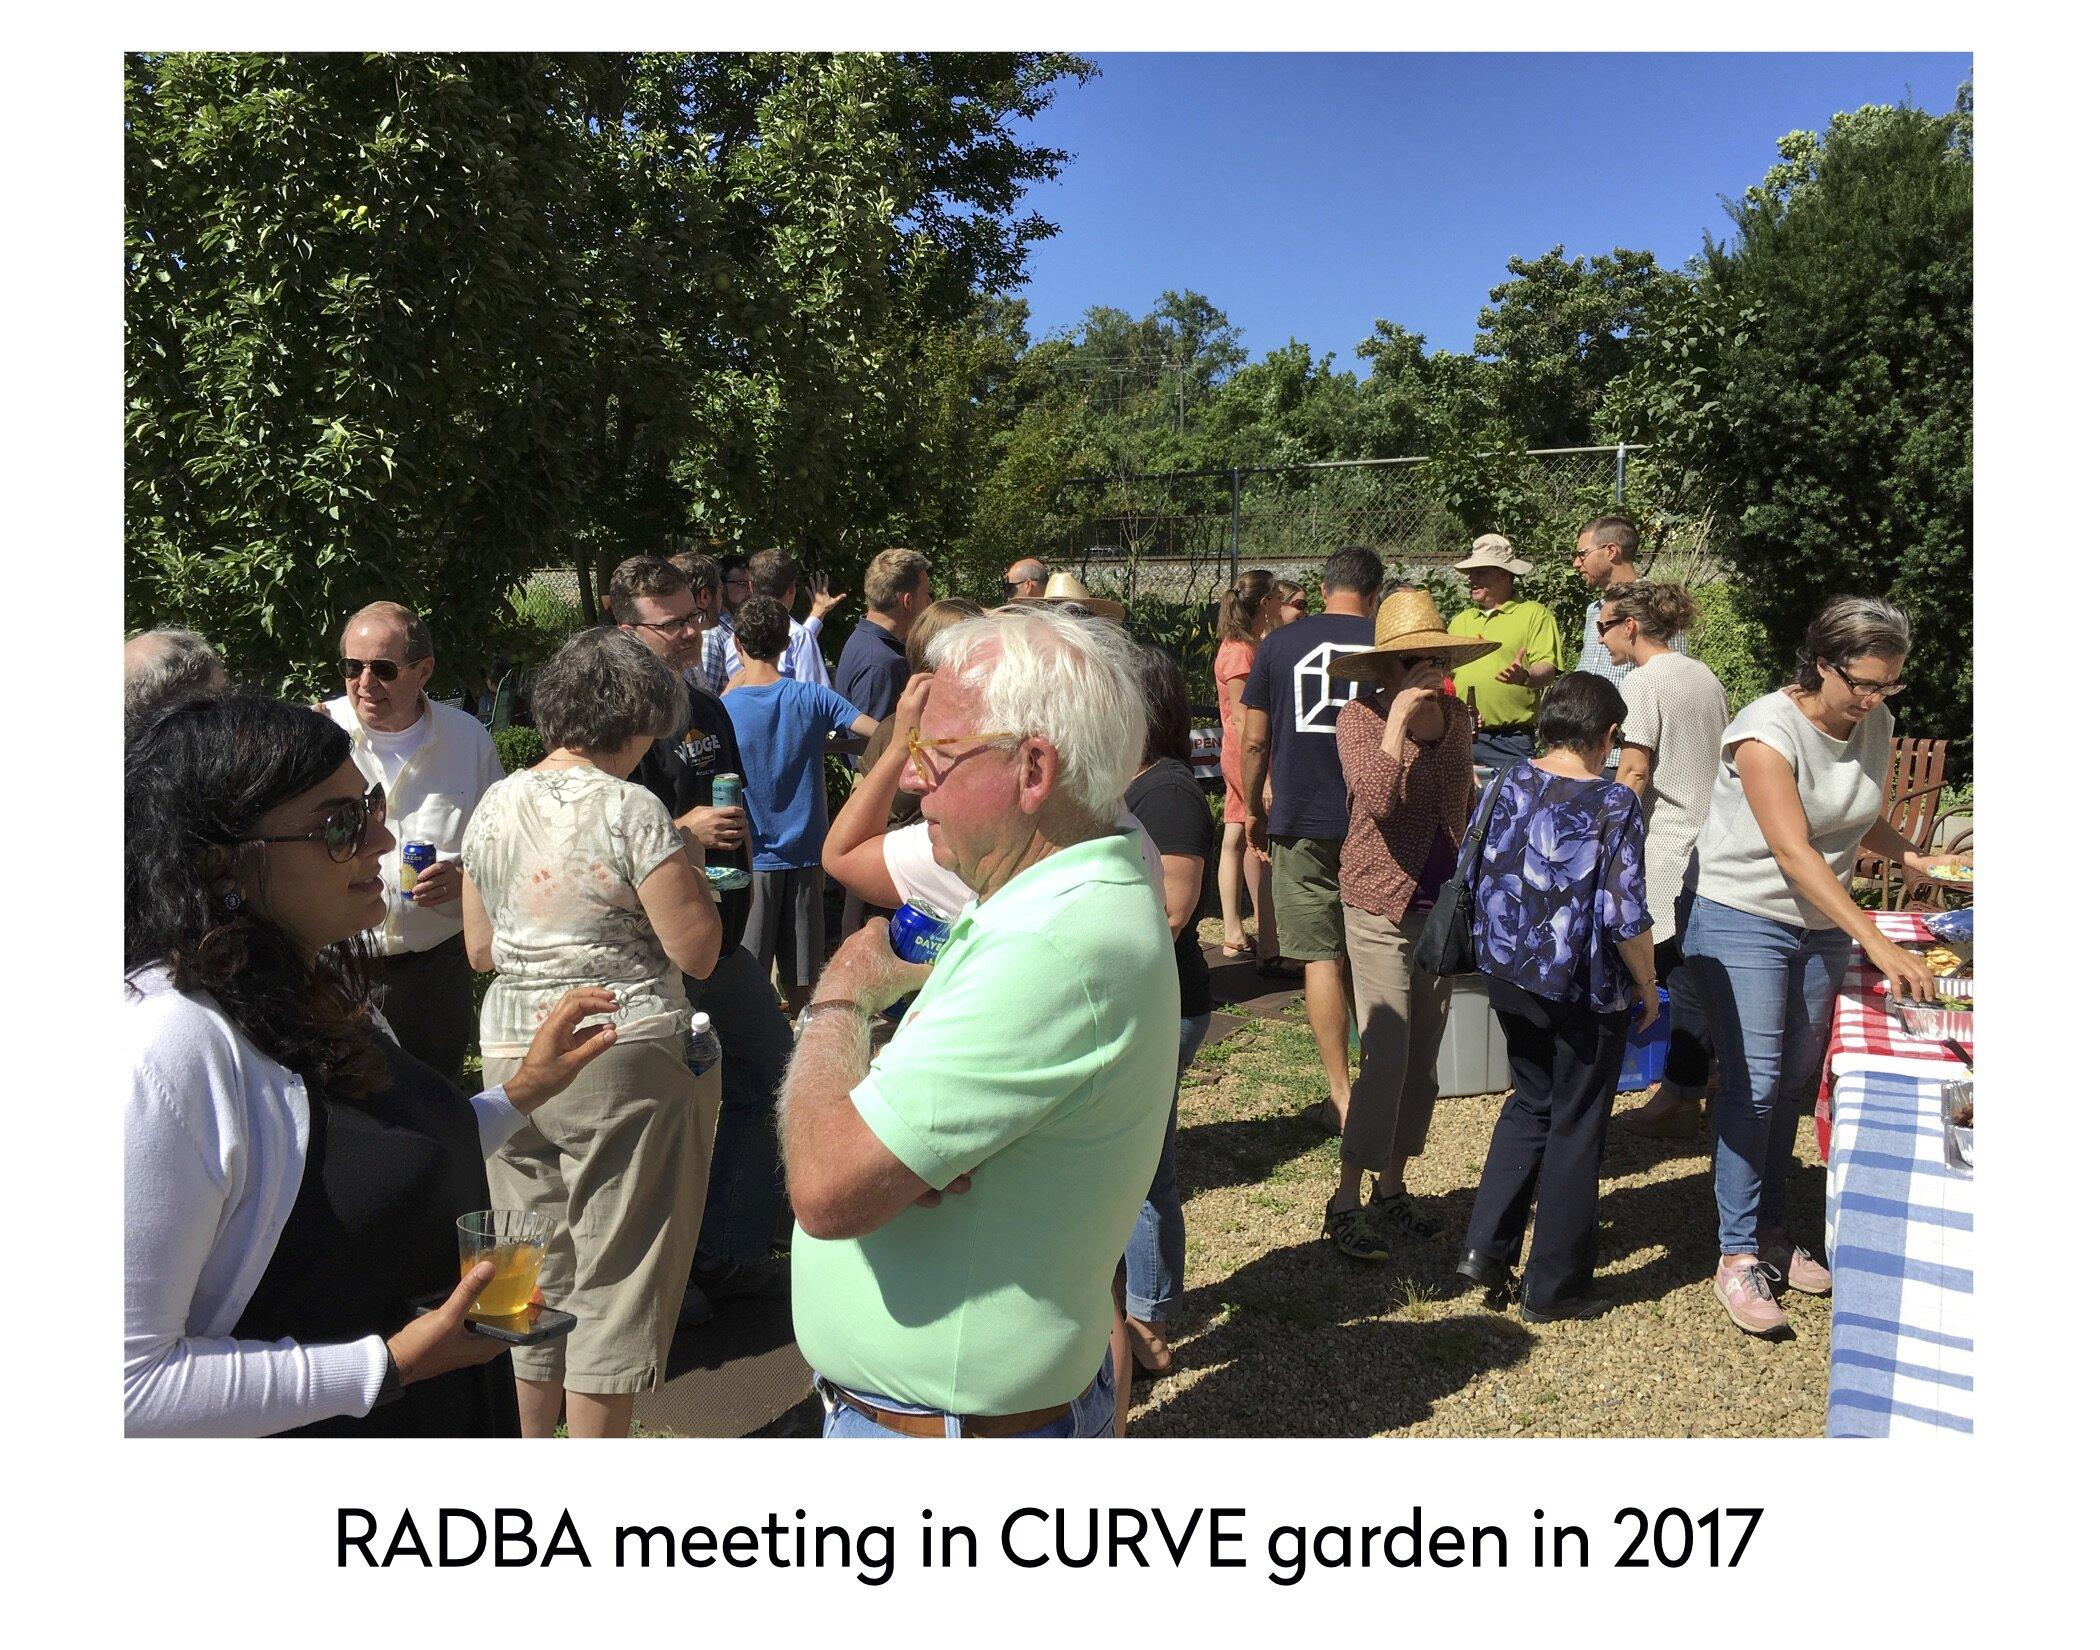 radba meeting in garden 2017.jpg